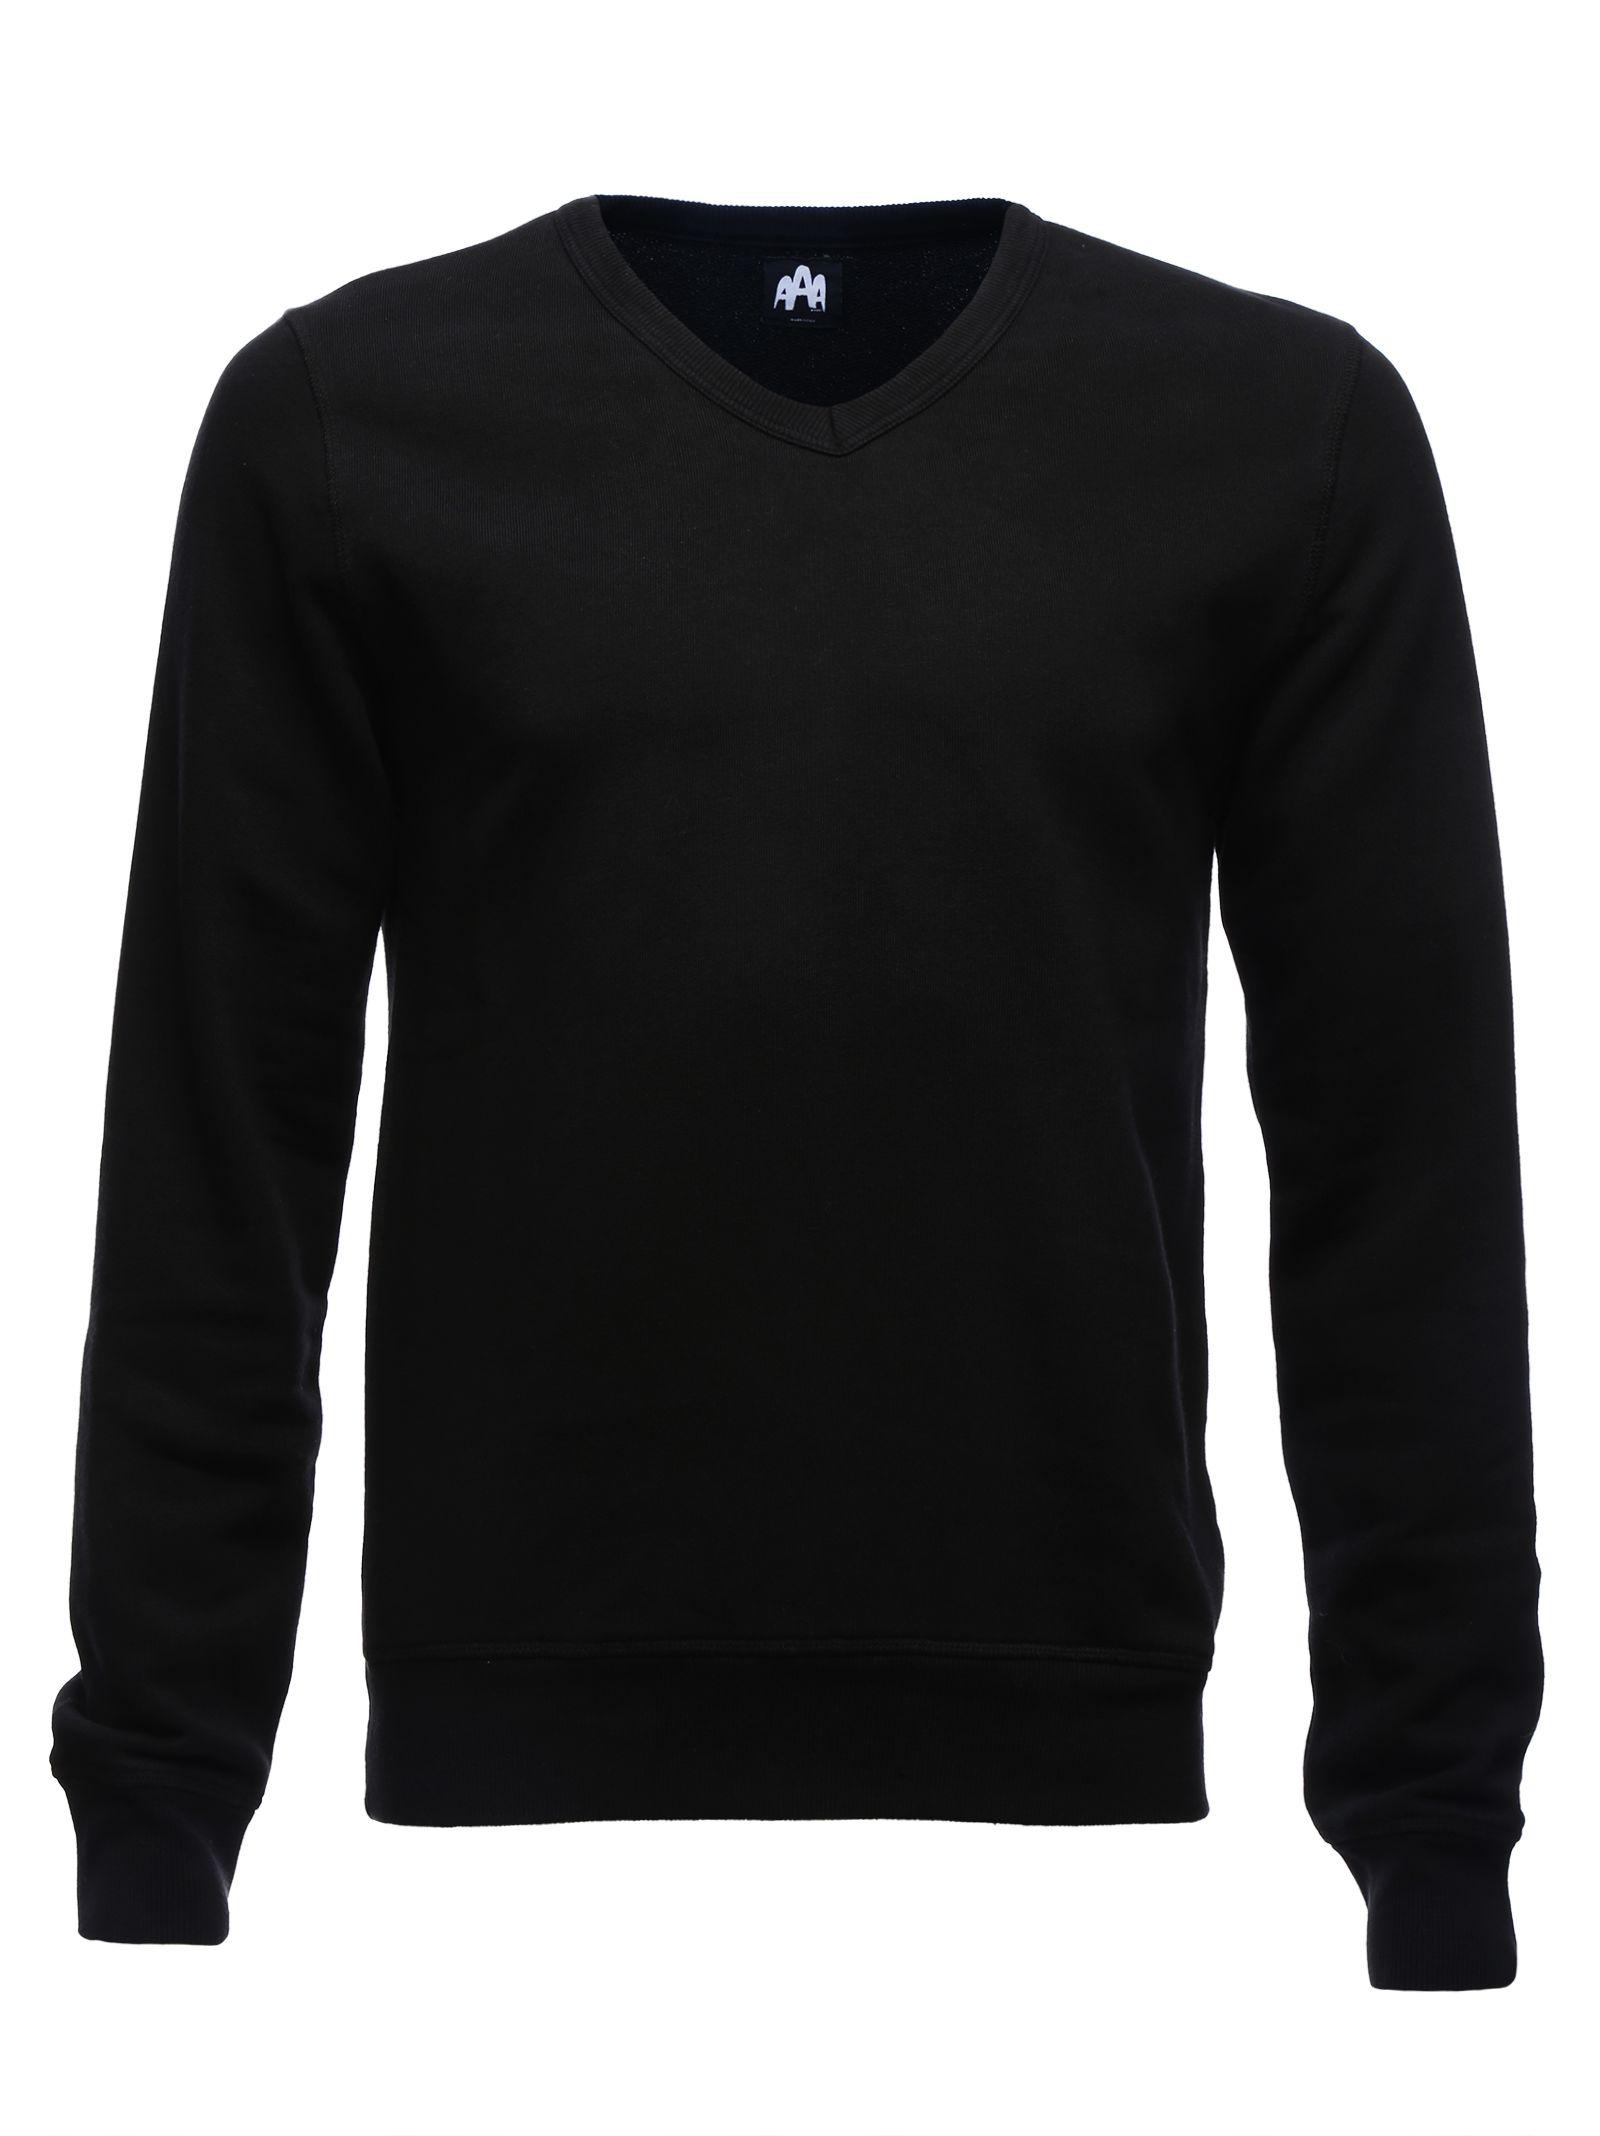 100% Cotton V-Neck Long Sleeve Sweatshirt